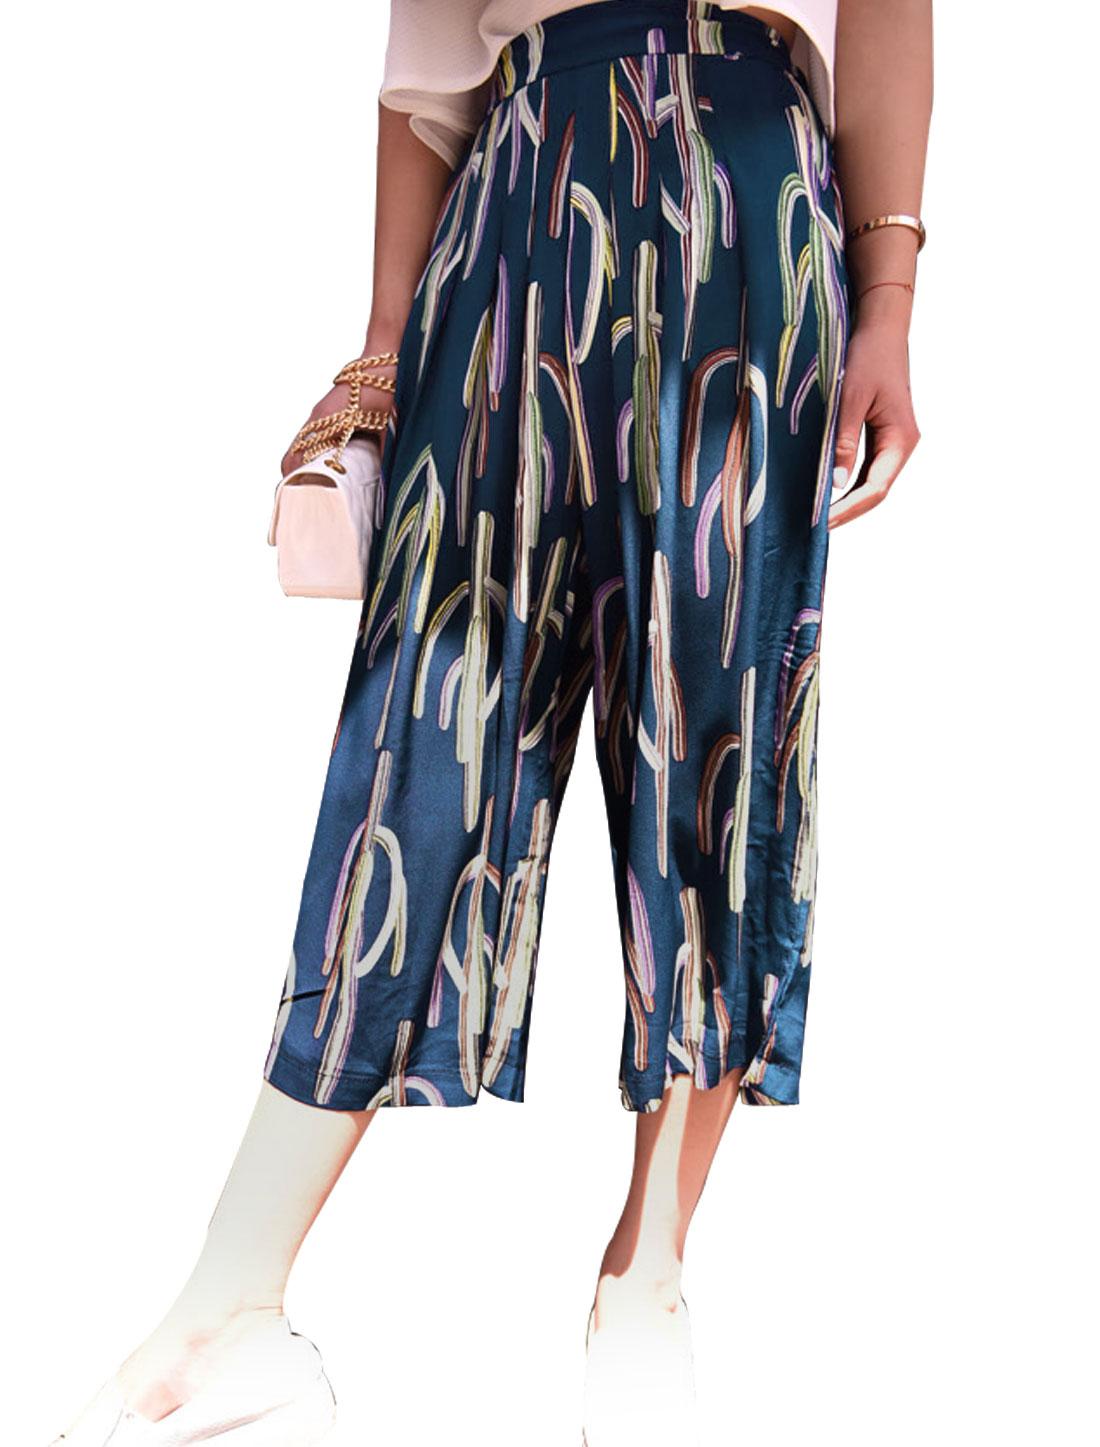 Lady Elastic Waist Cacti Prints Seam Pockets Capri Pants Navy Blue XS